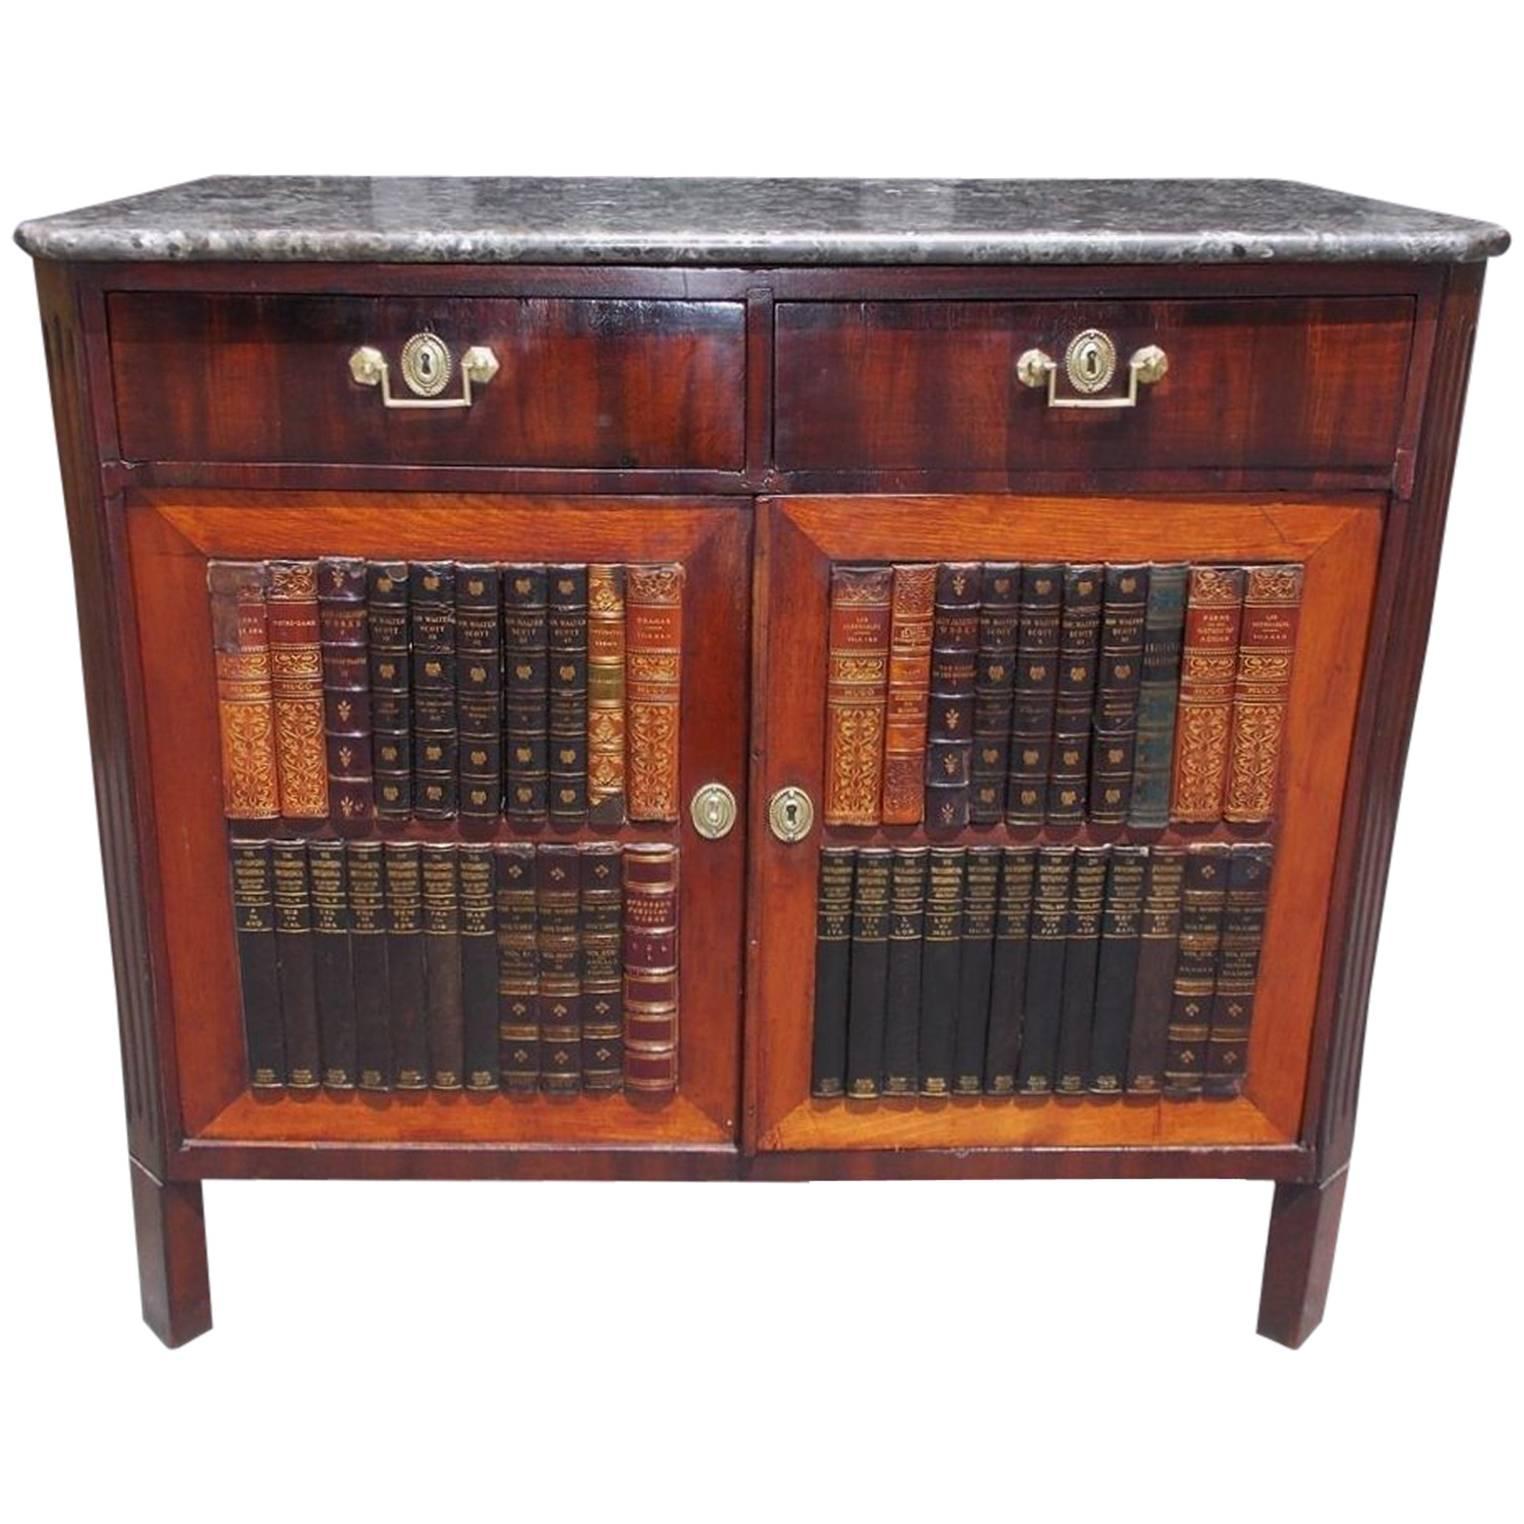 English Regency Mahogany Marble-Top Bookcase Cabinet, Circa 1815